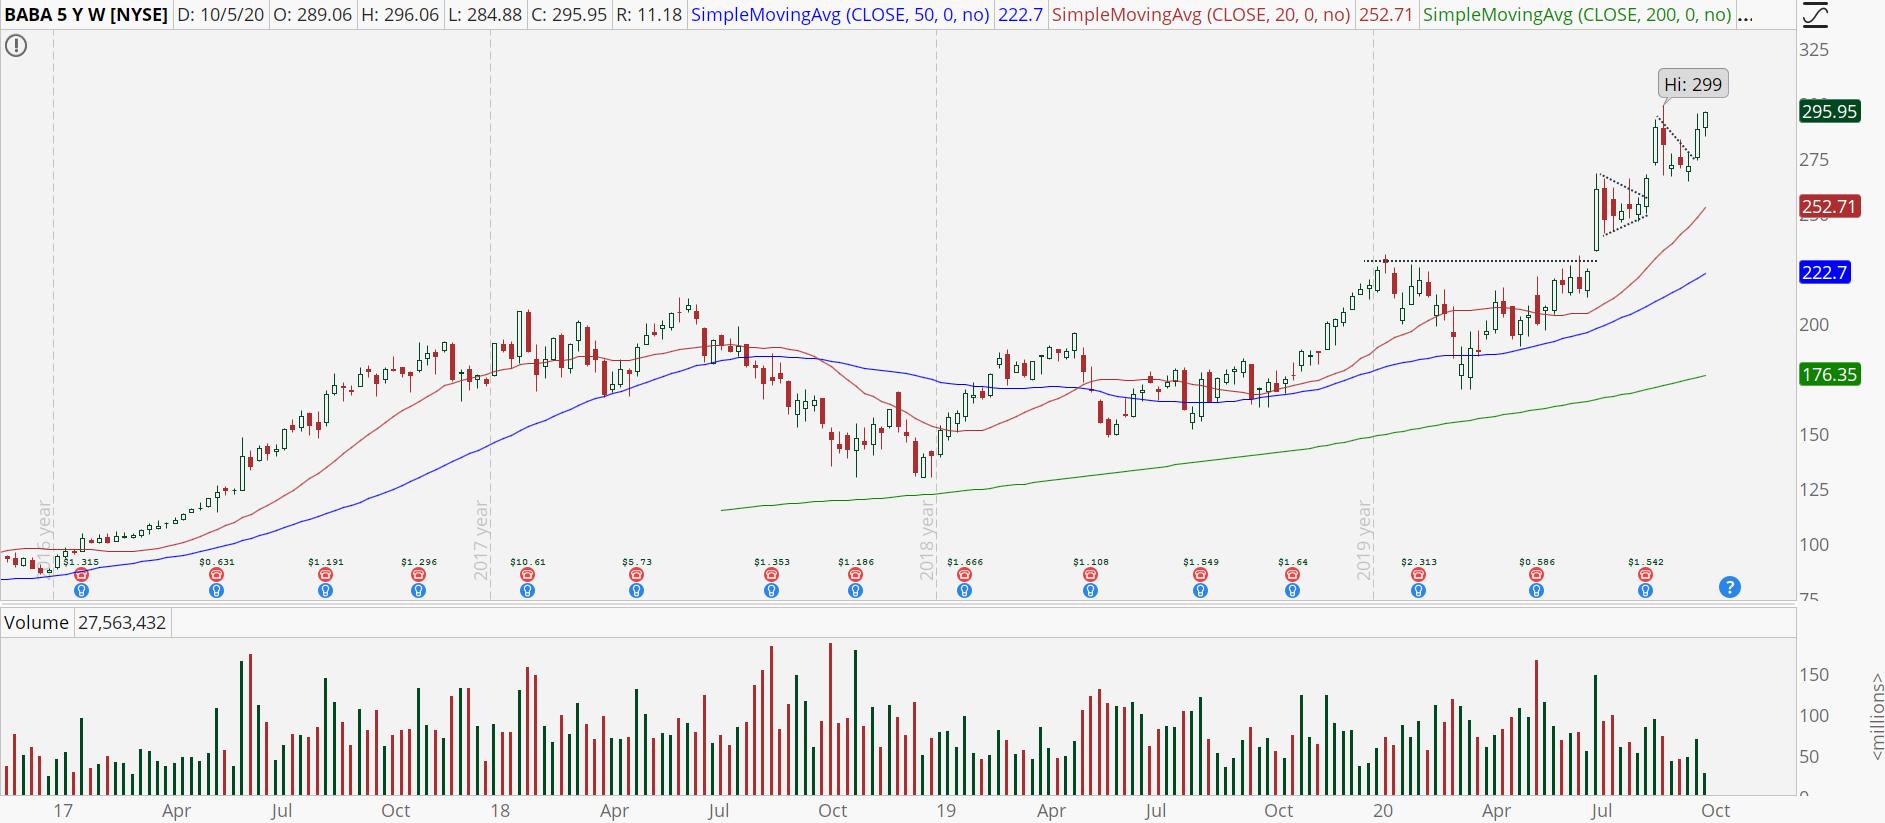 Alibaba (BABA) weekly chart with powerful uptrend